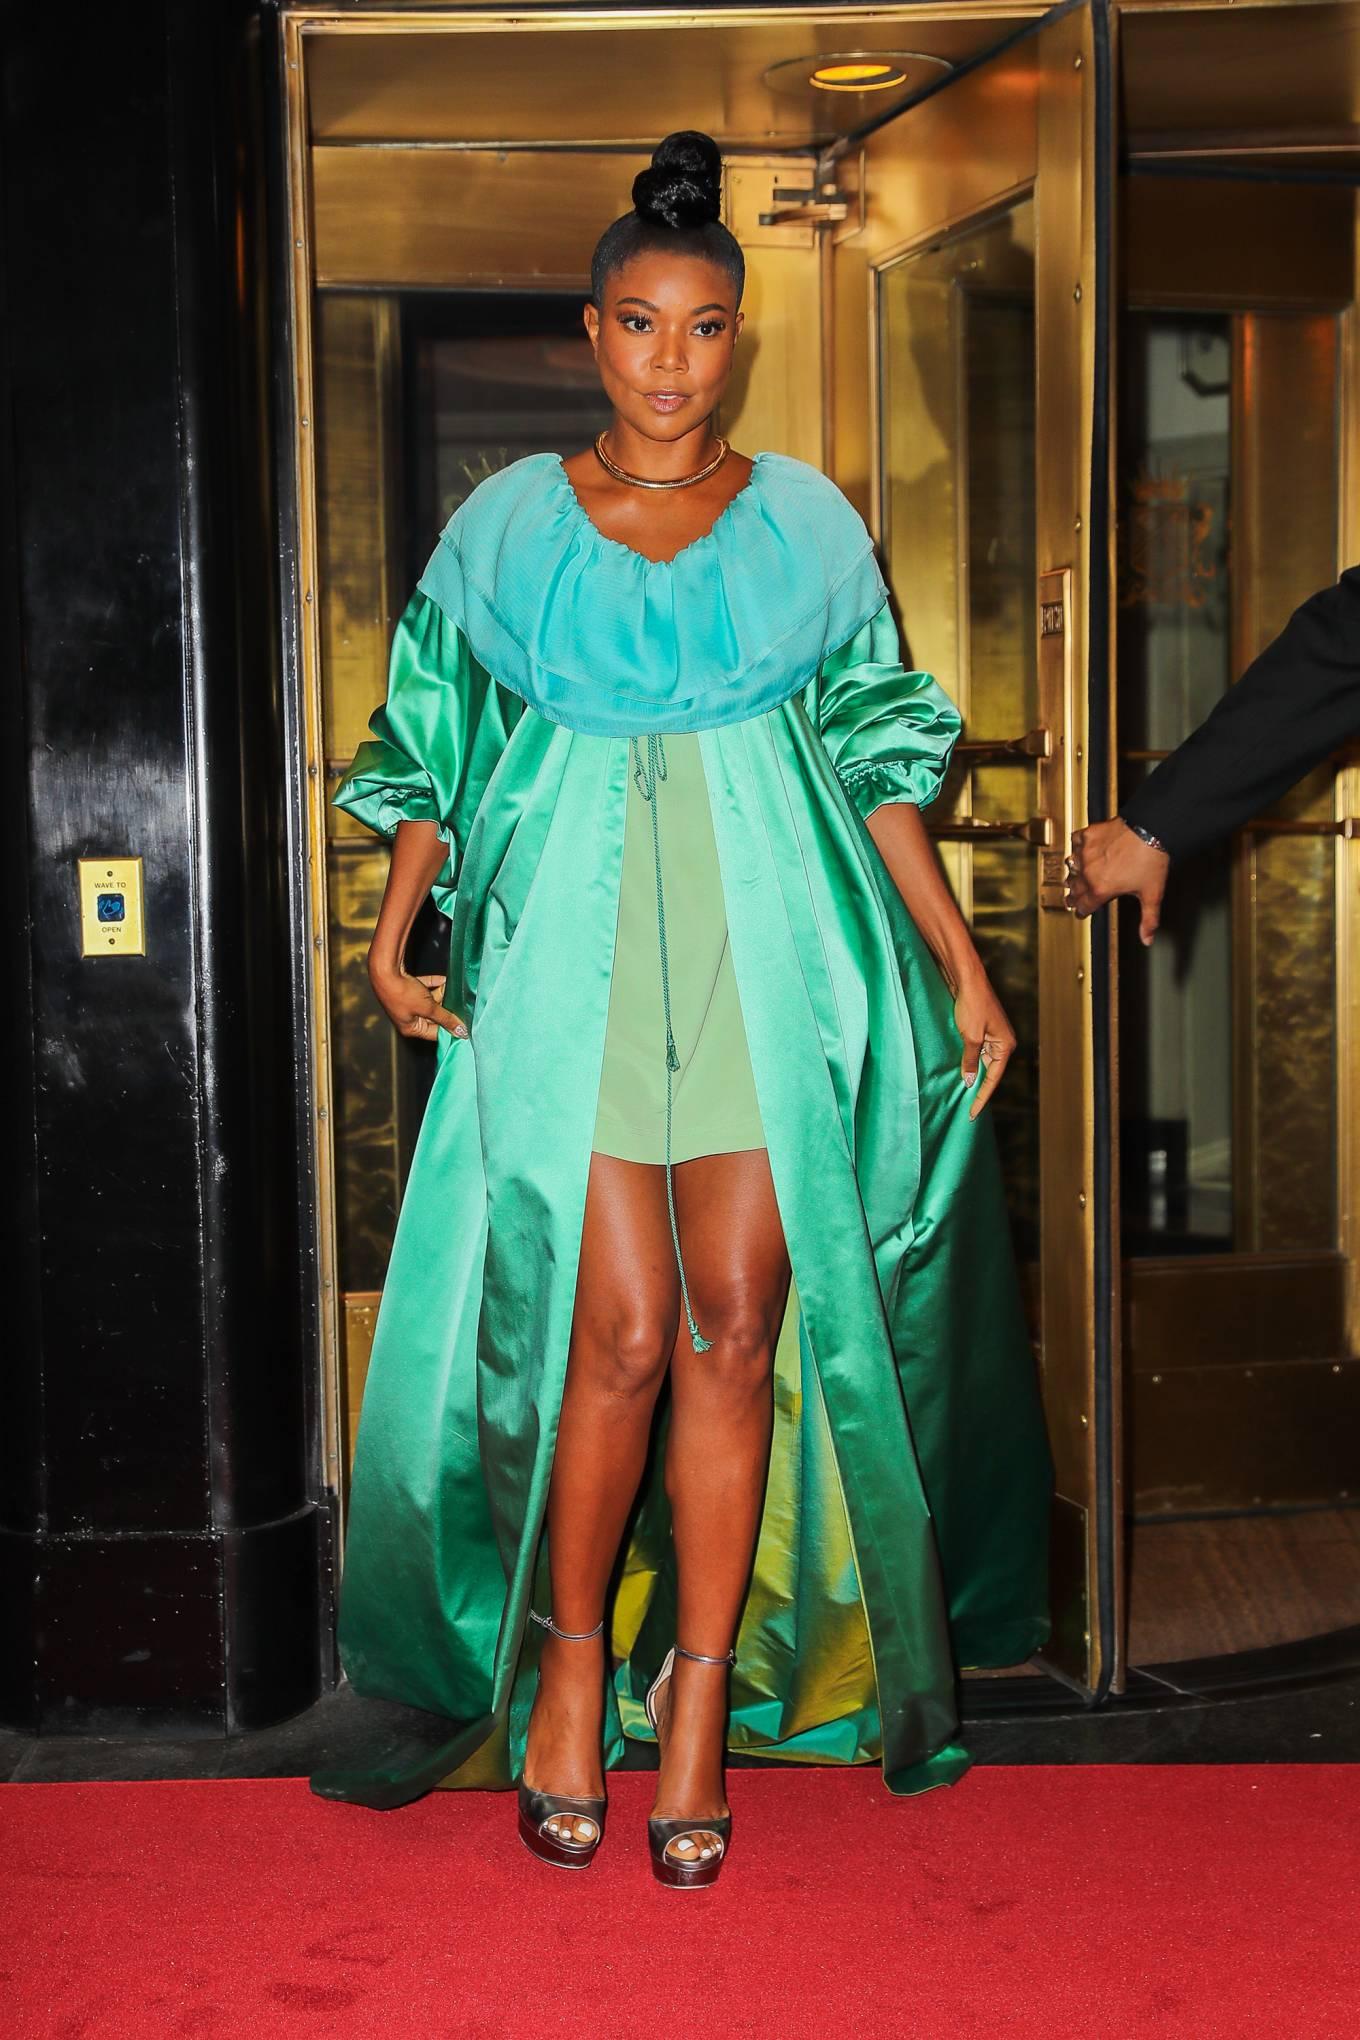 Gabrielle Union 2021 : Gabrielle Union – Seen in a green dress in New York-09